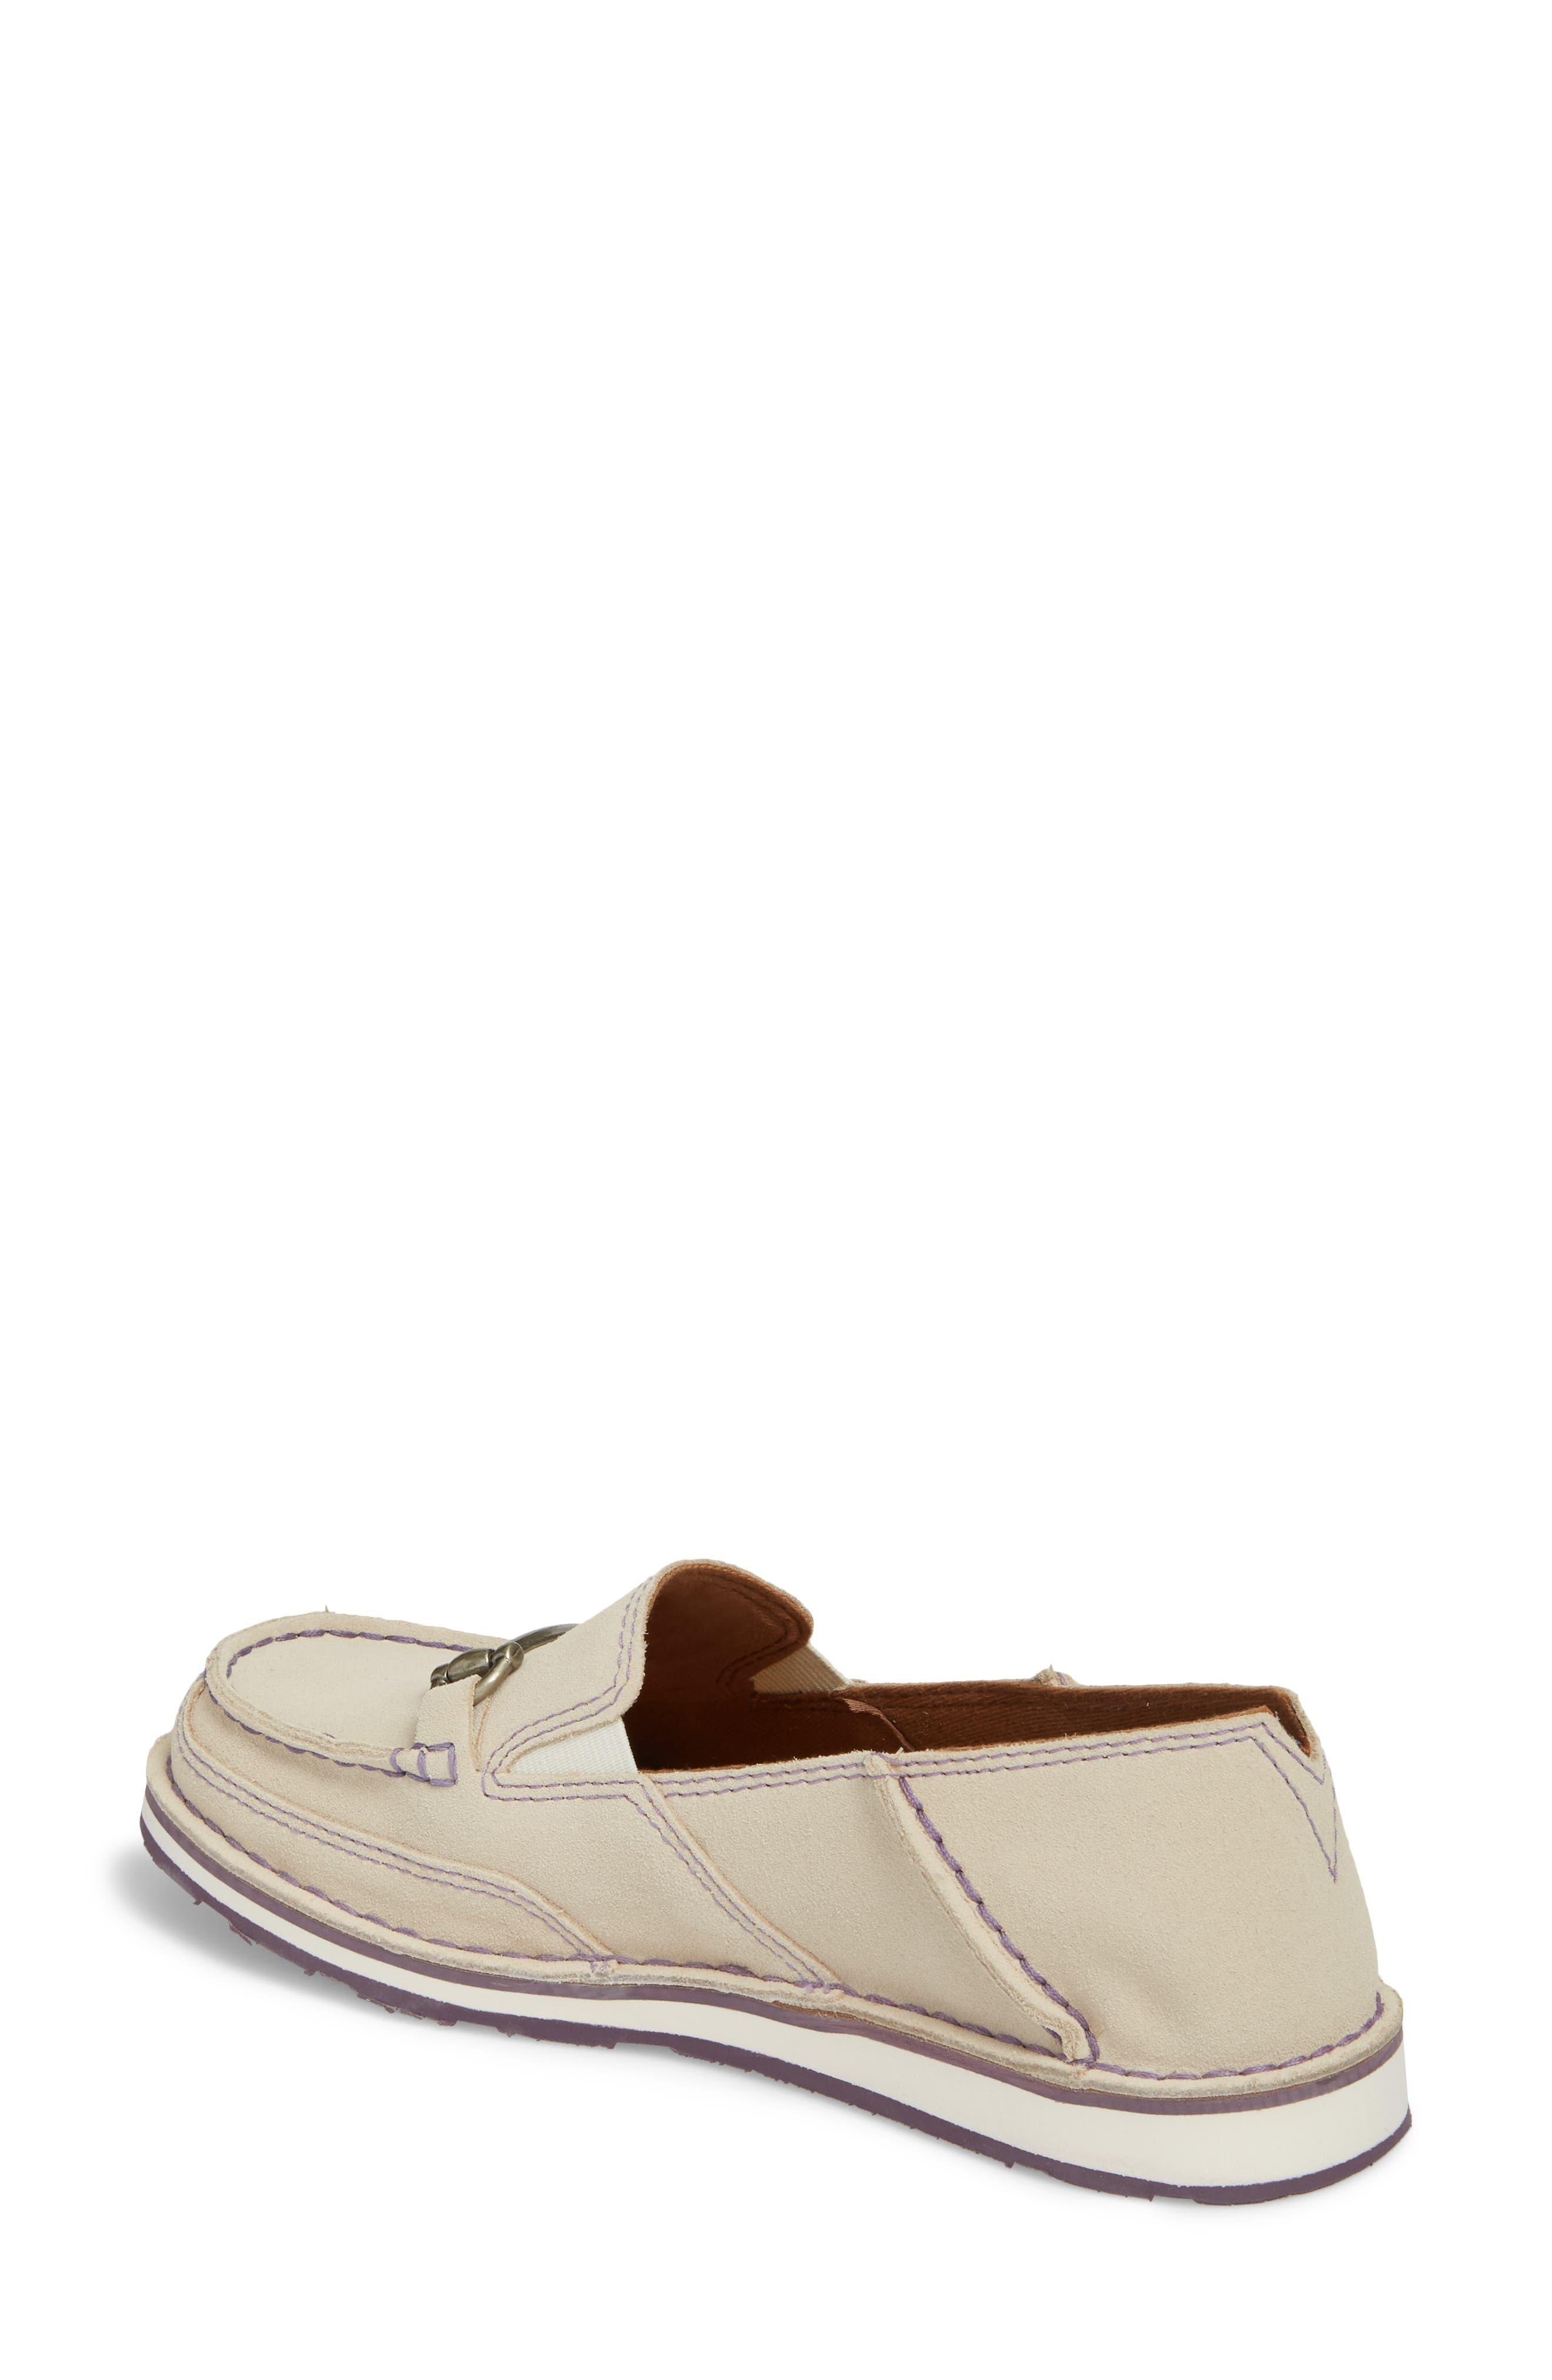 ARIAT,                             Cruiser Castaway Loafer,                             Alternate thumbnail 2, color,                             CRUISER SAND SUEDE